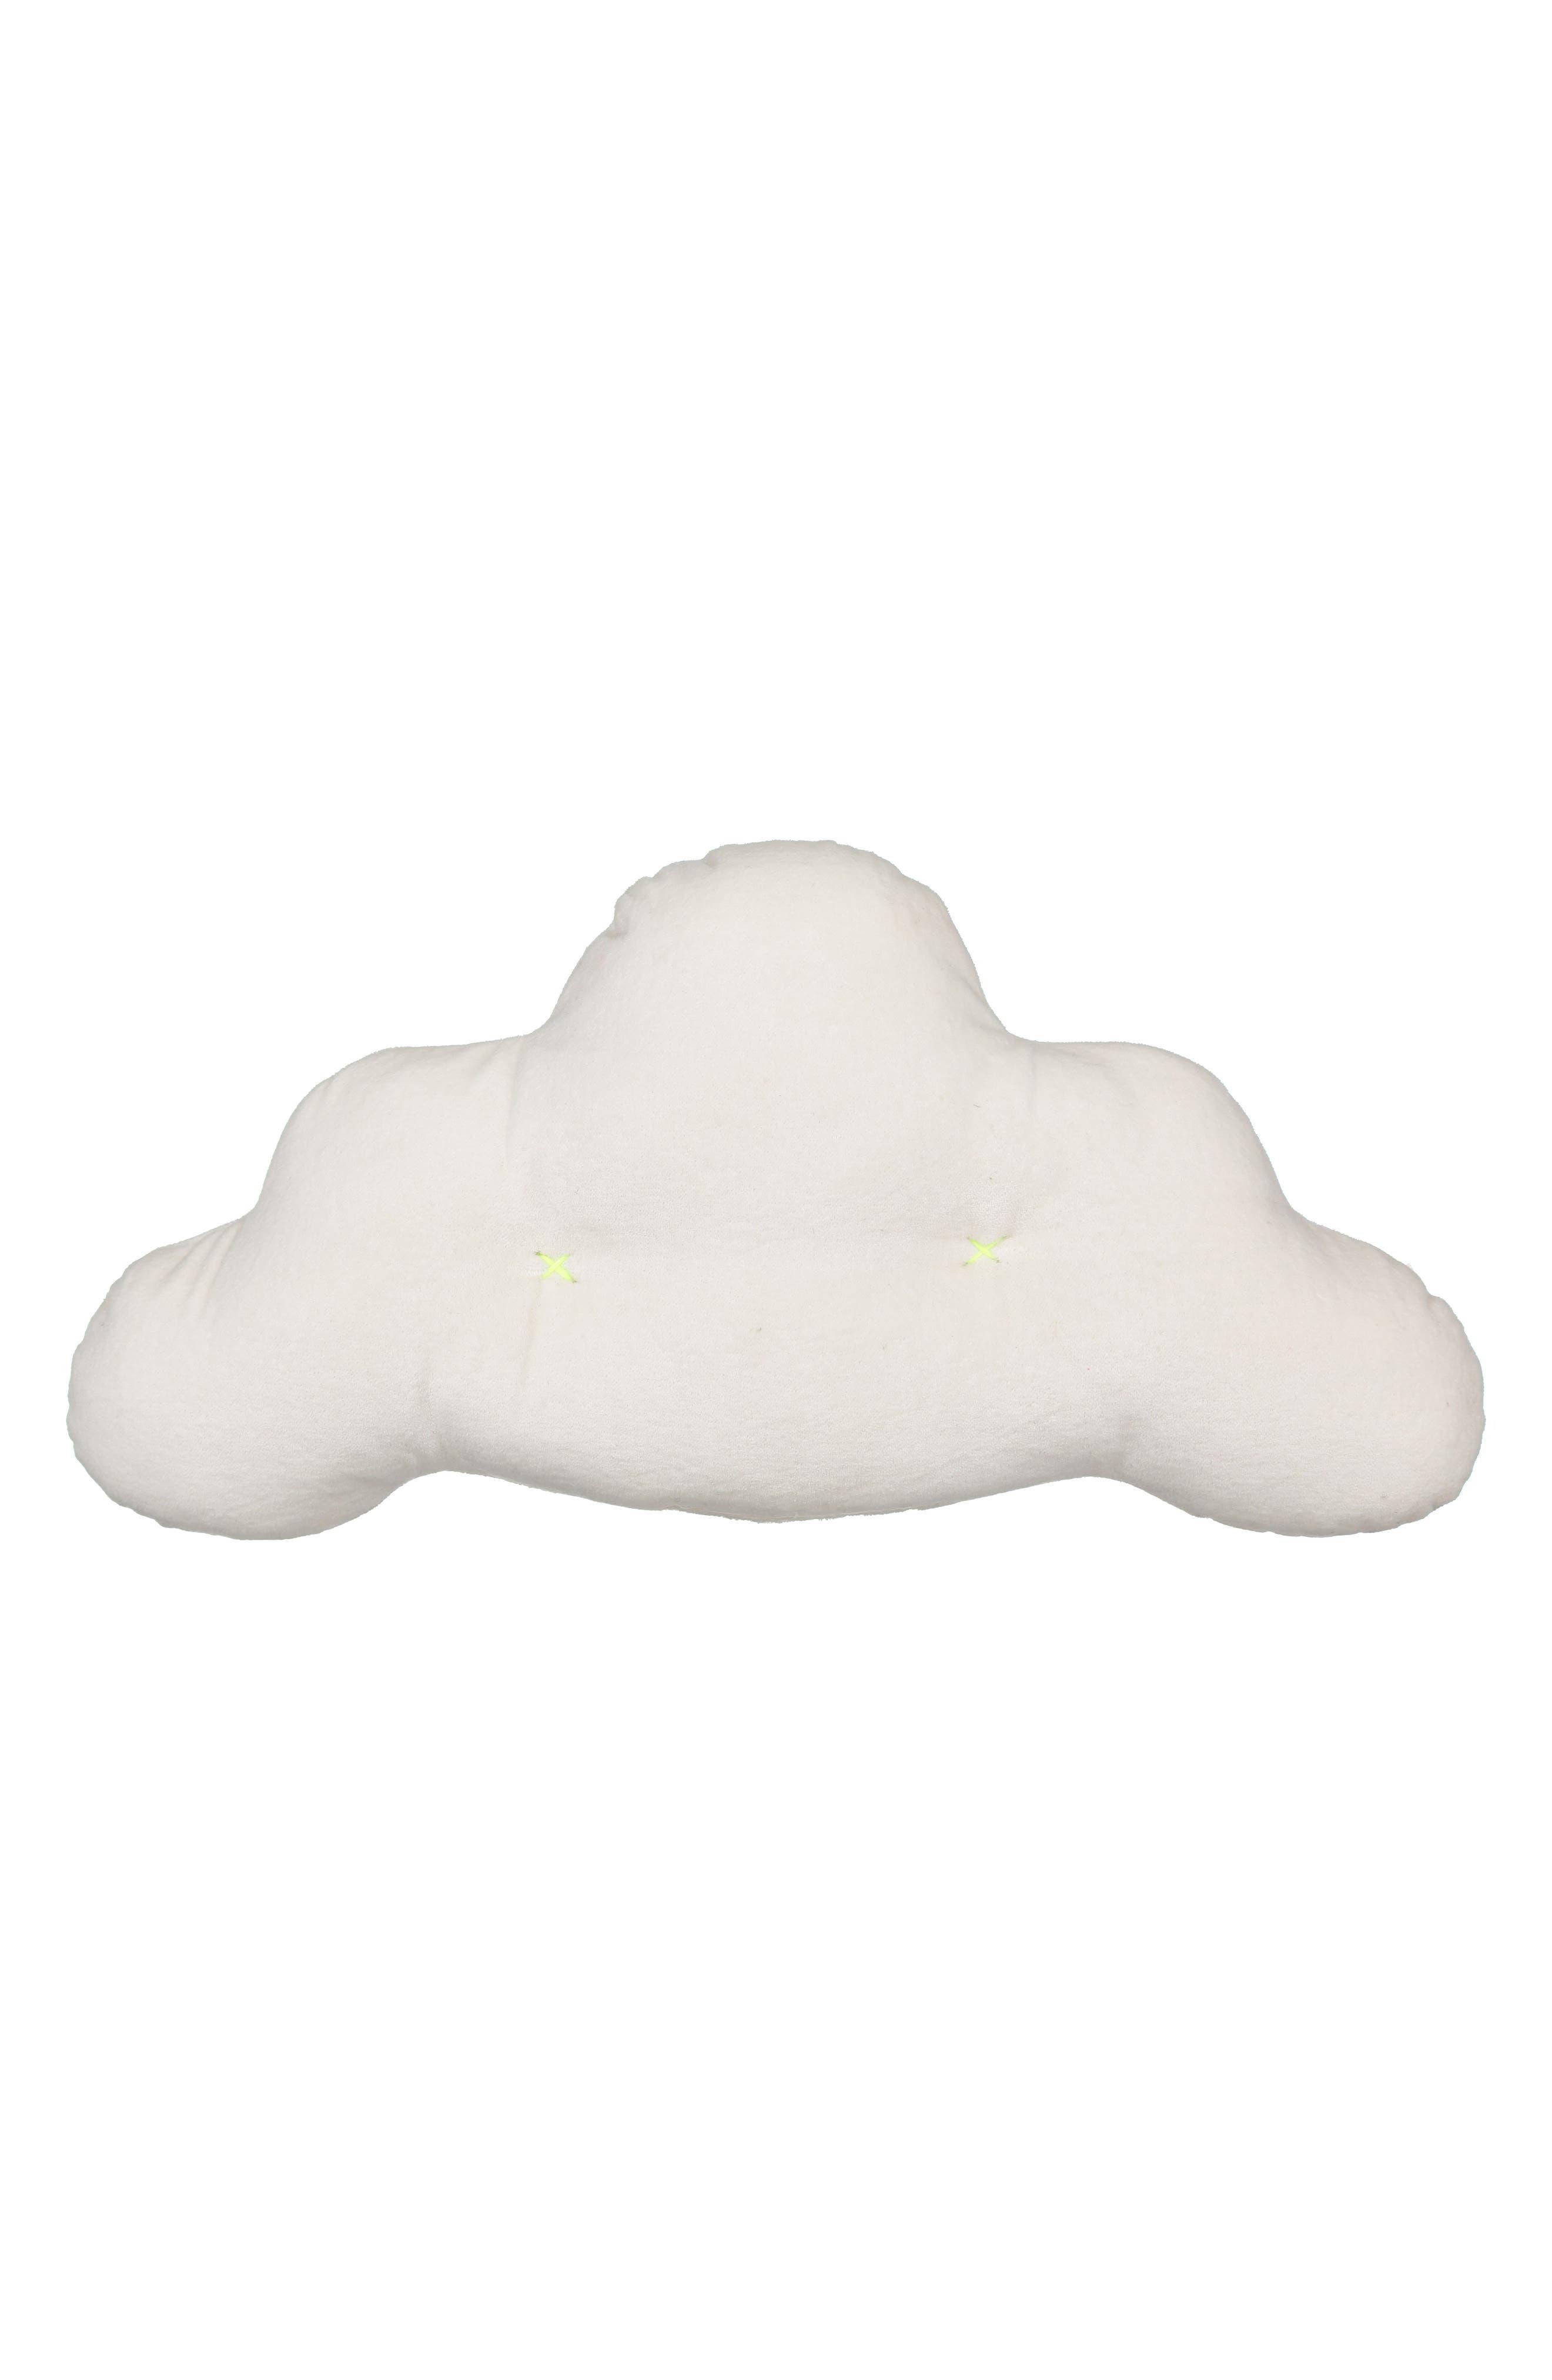 Velvet Cloud Pillow,                             Main thumbnail 1, color,                             White